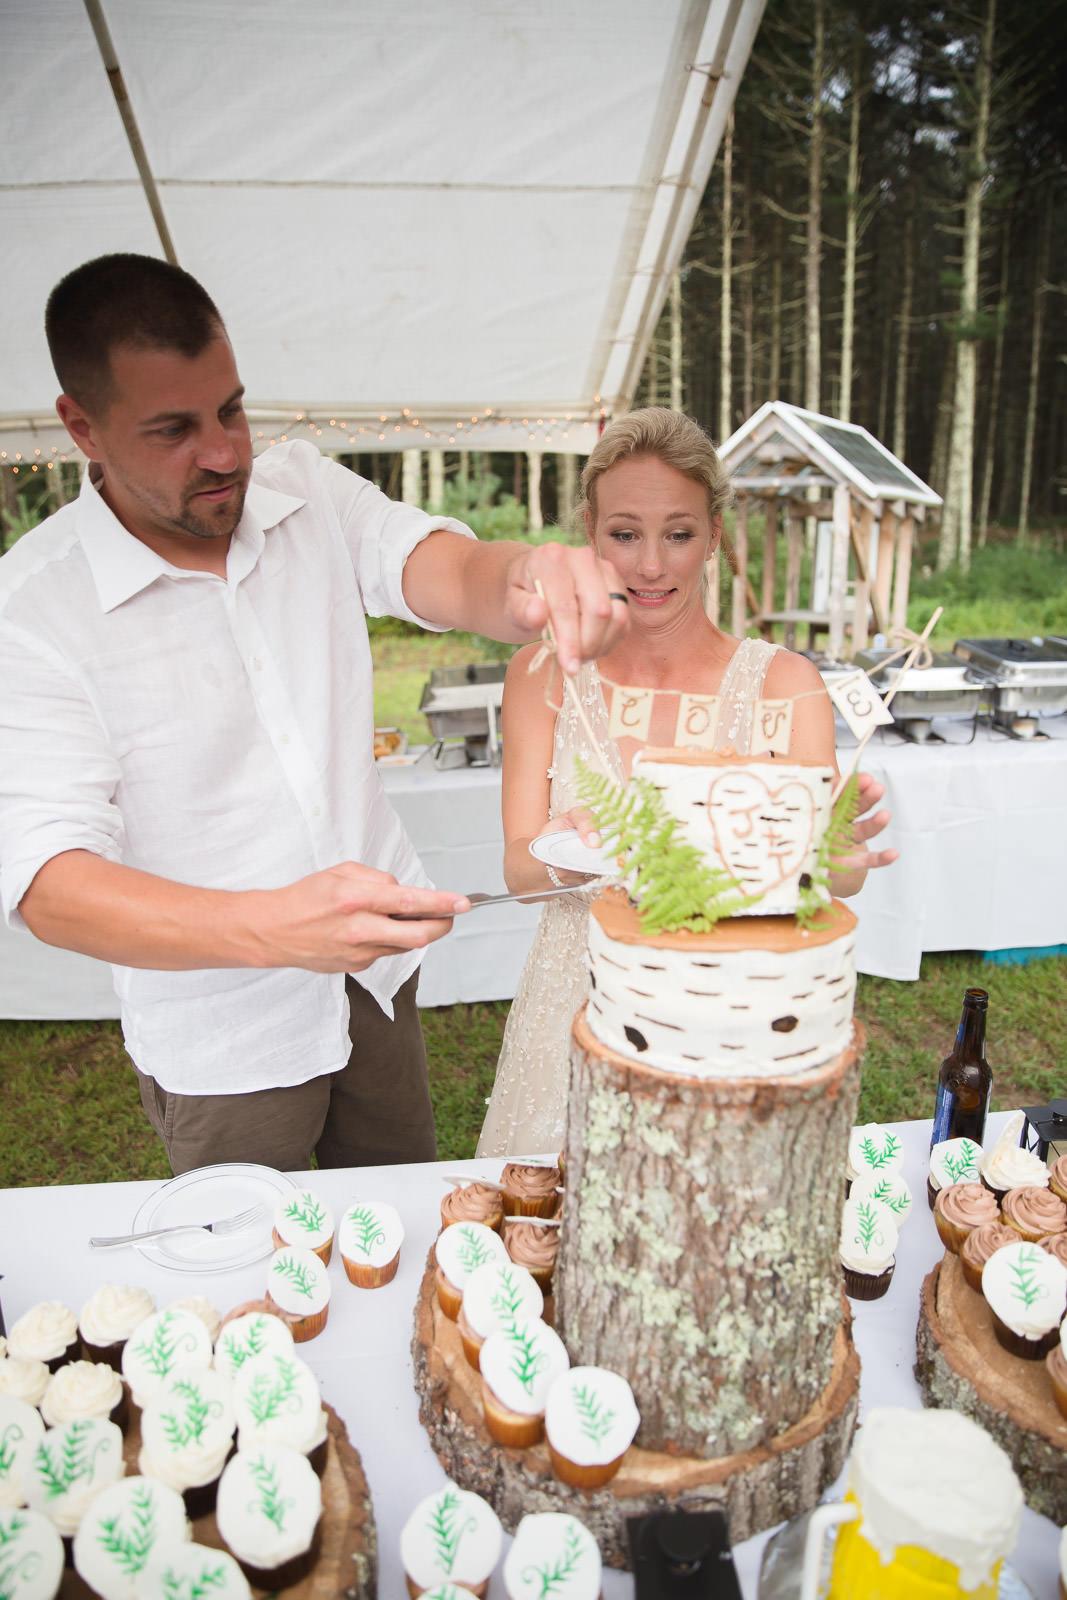 Coventry, Rhode Island, RI, Backyard Wedding, forest, earthy, wedding, tracy jenkins photography, wedding photographer, ri wedding photographer, Rhode Island Wedding photographer, wedding cake, cake cutting